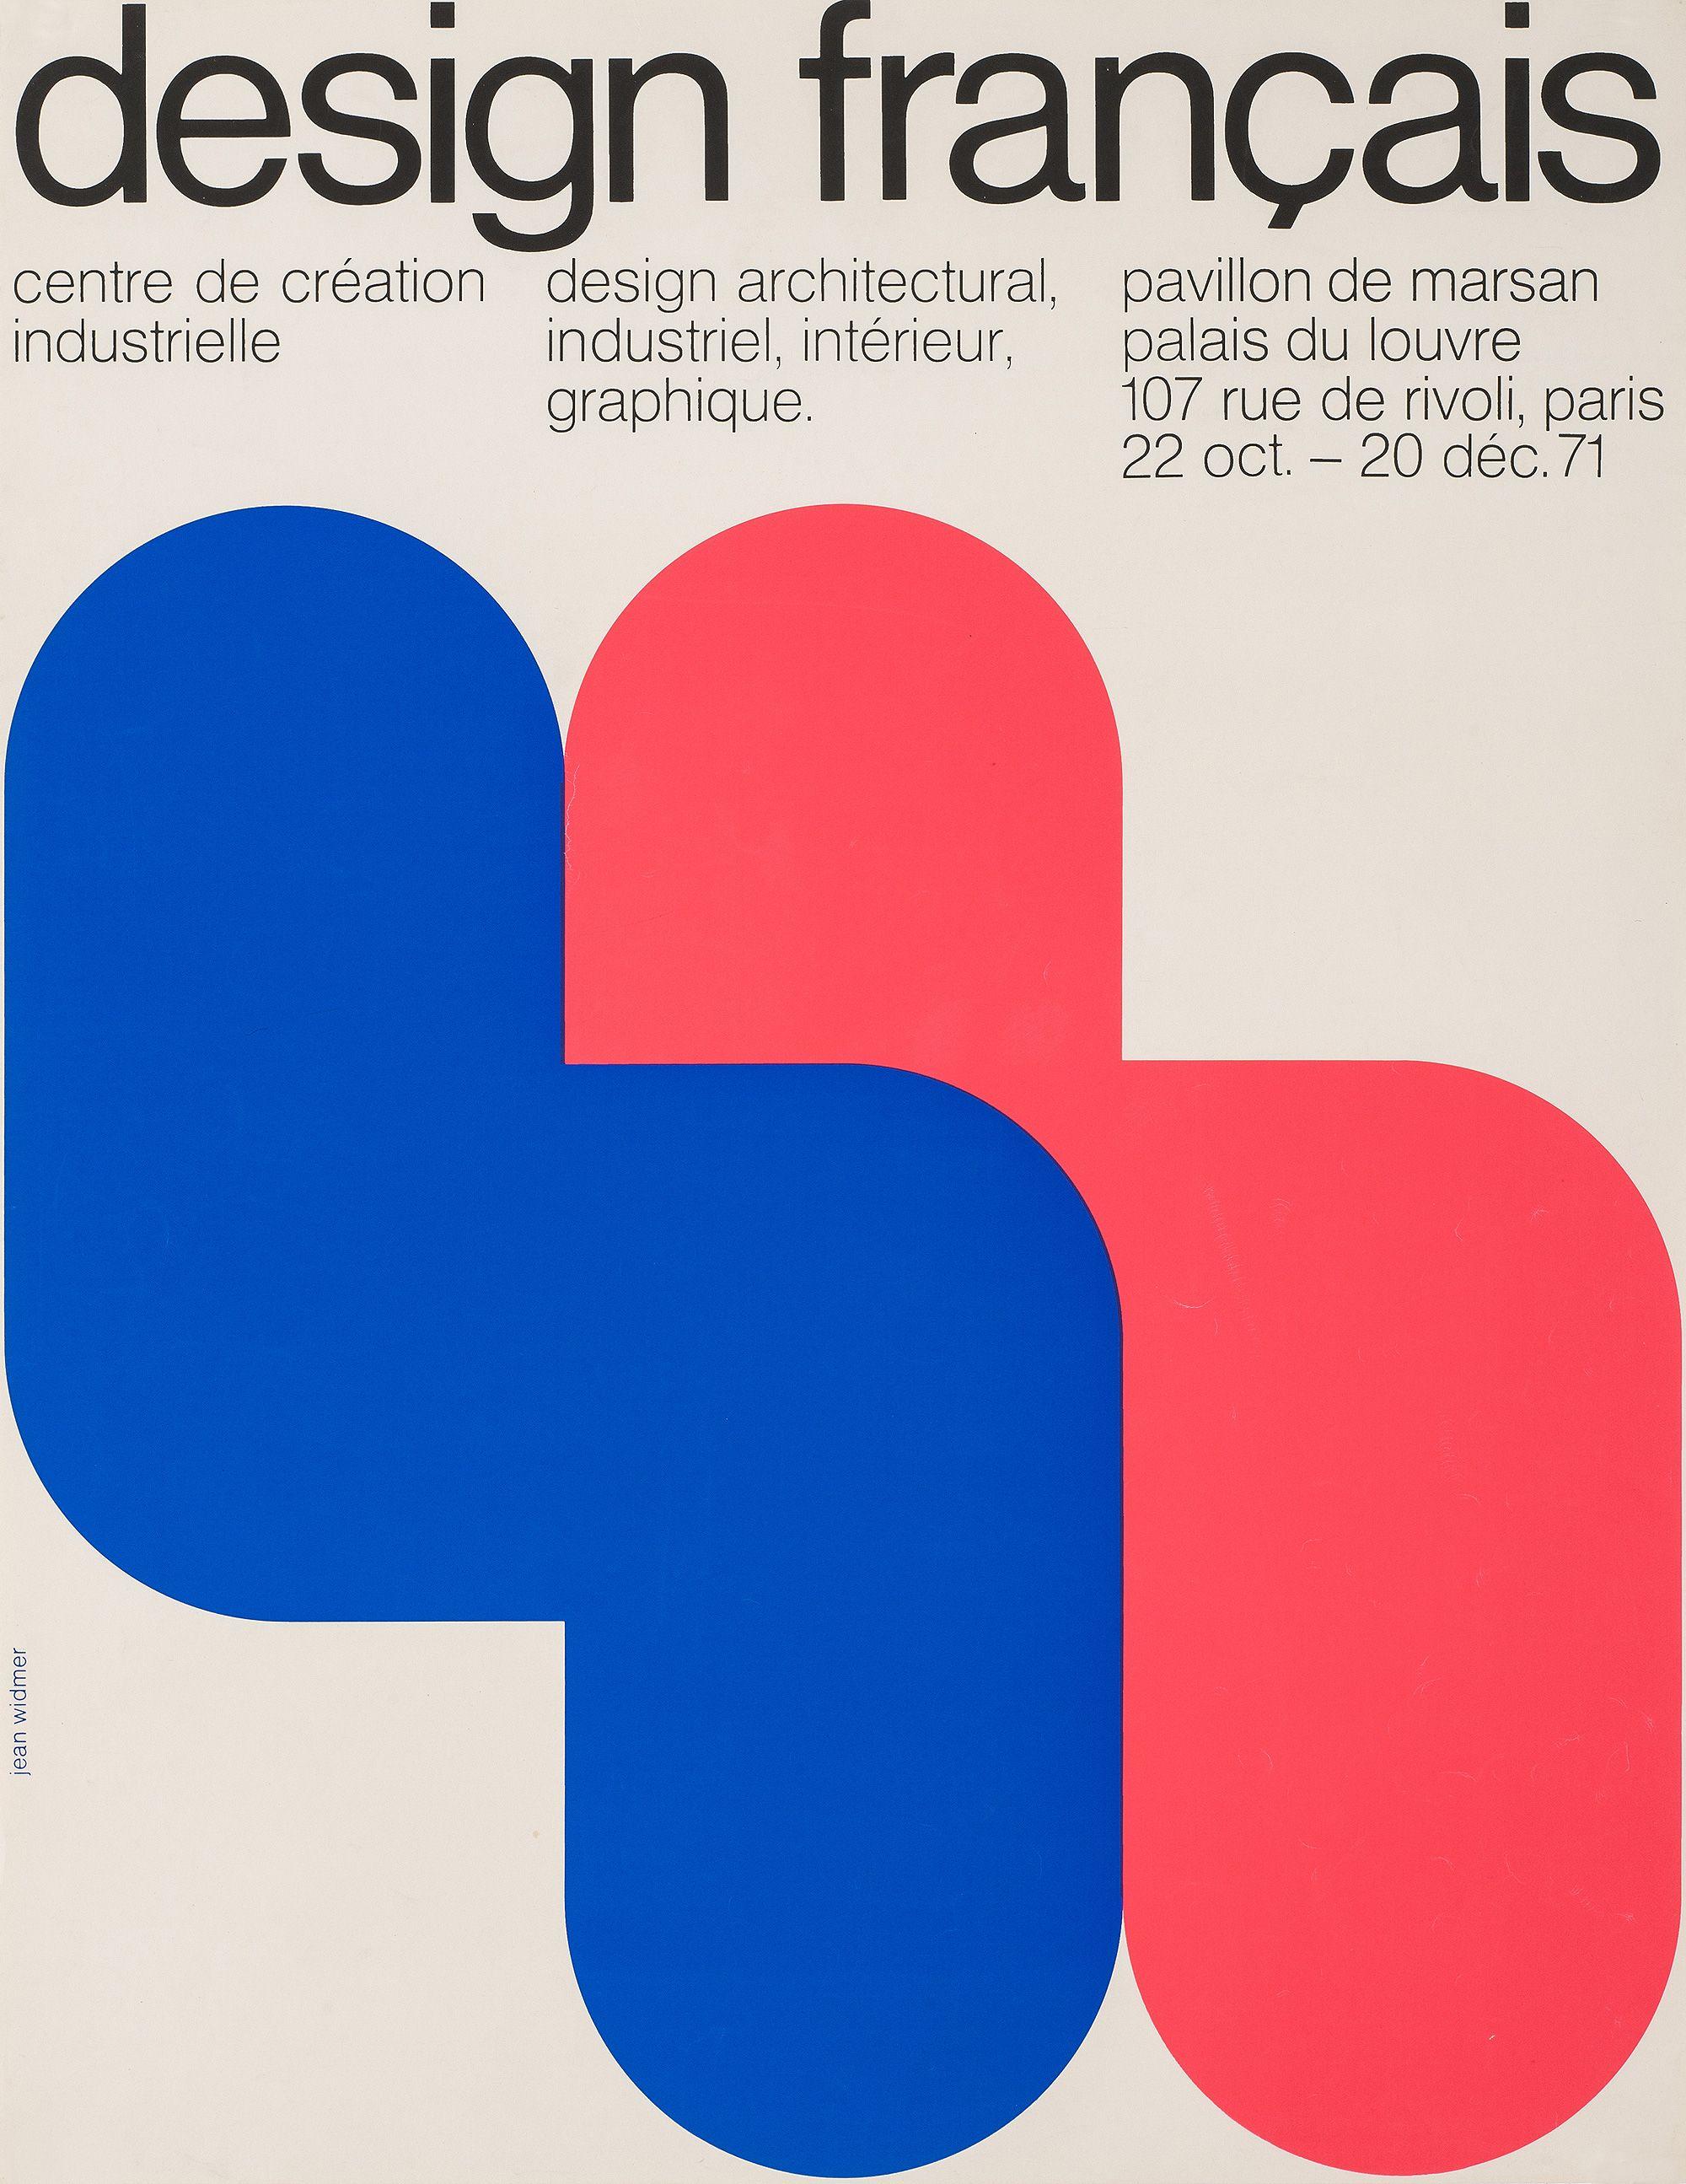 Poster design history - Jean Widmer Poster Design Fran Ais 22 Octobre Au 20 D Cembre 1971 1971